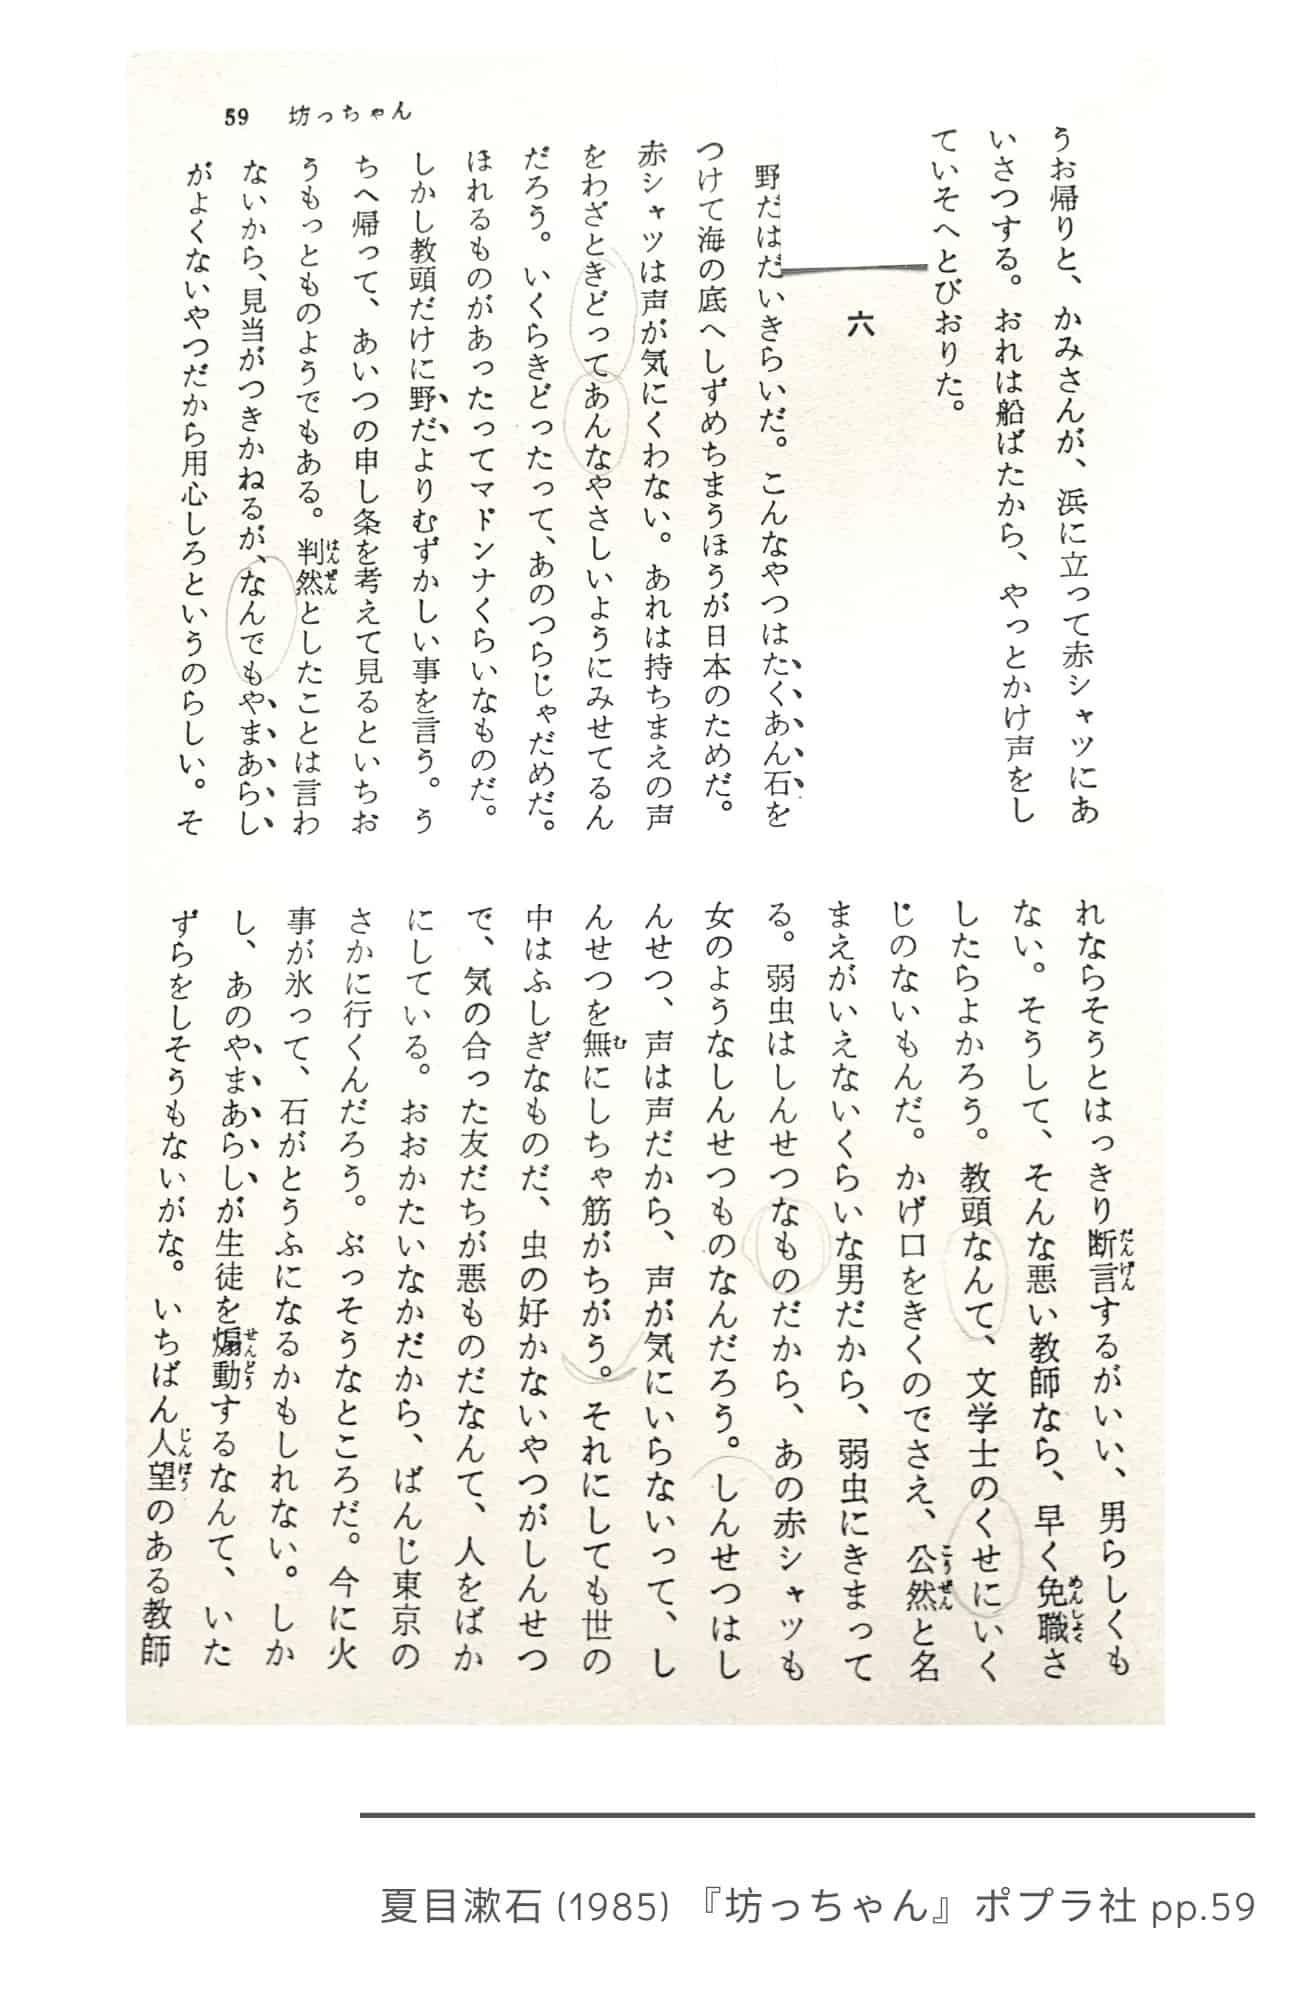 Botchan, Chapter Six Intro, pp.59